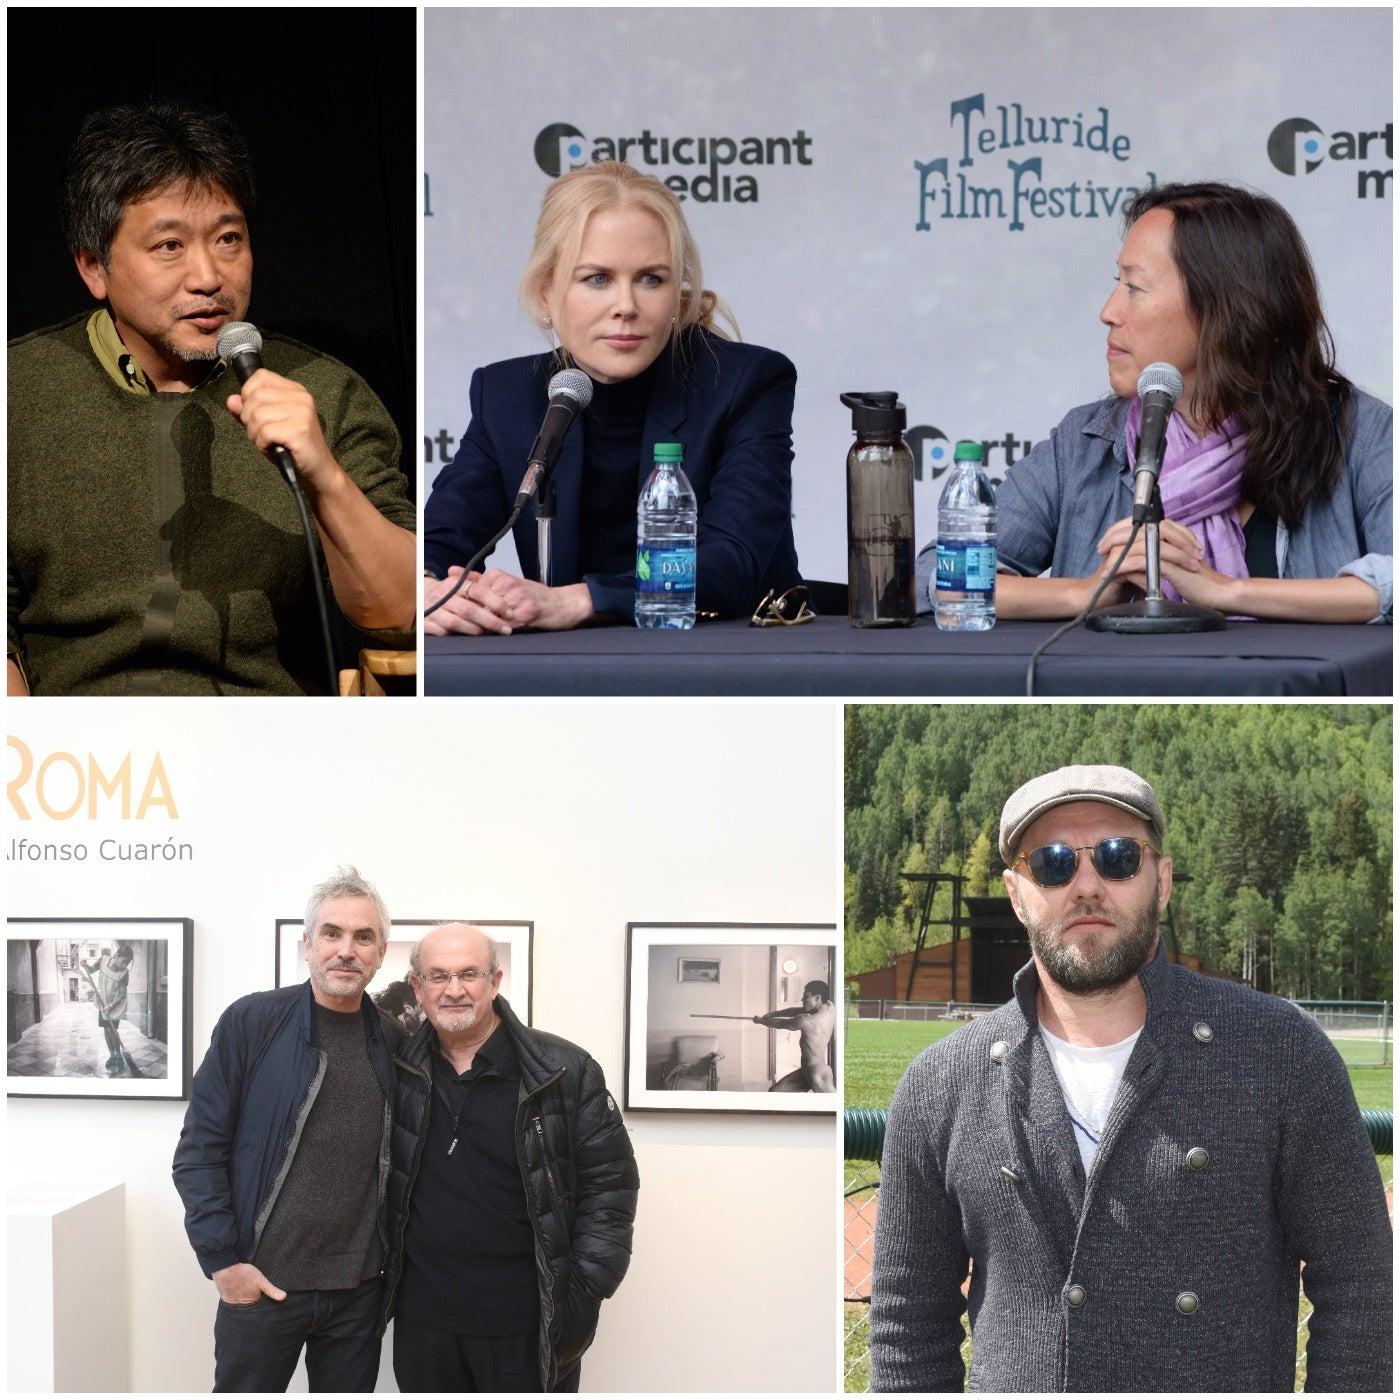 Talent at the 2018 Telluiride Film Festival